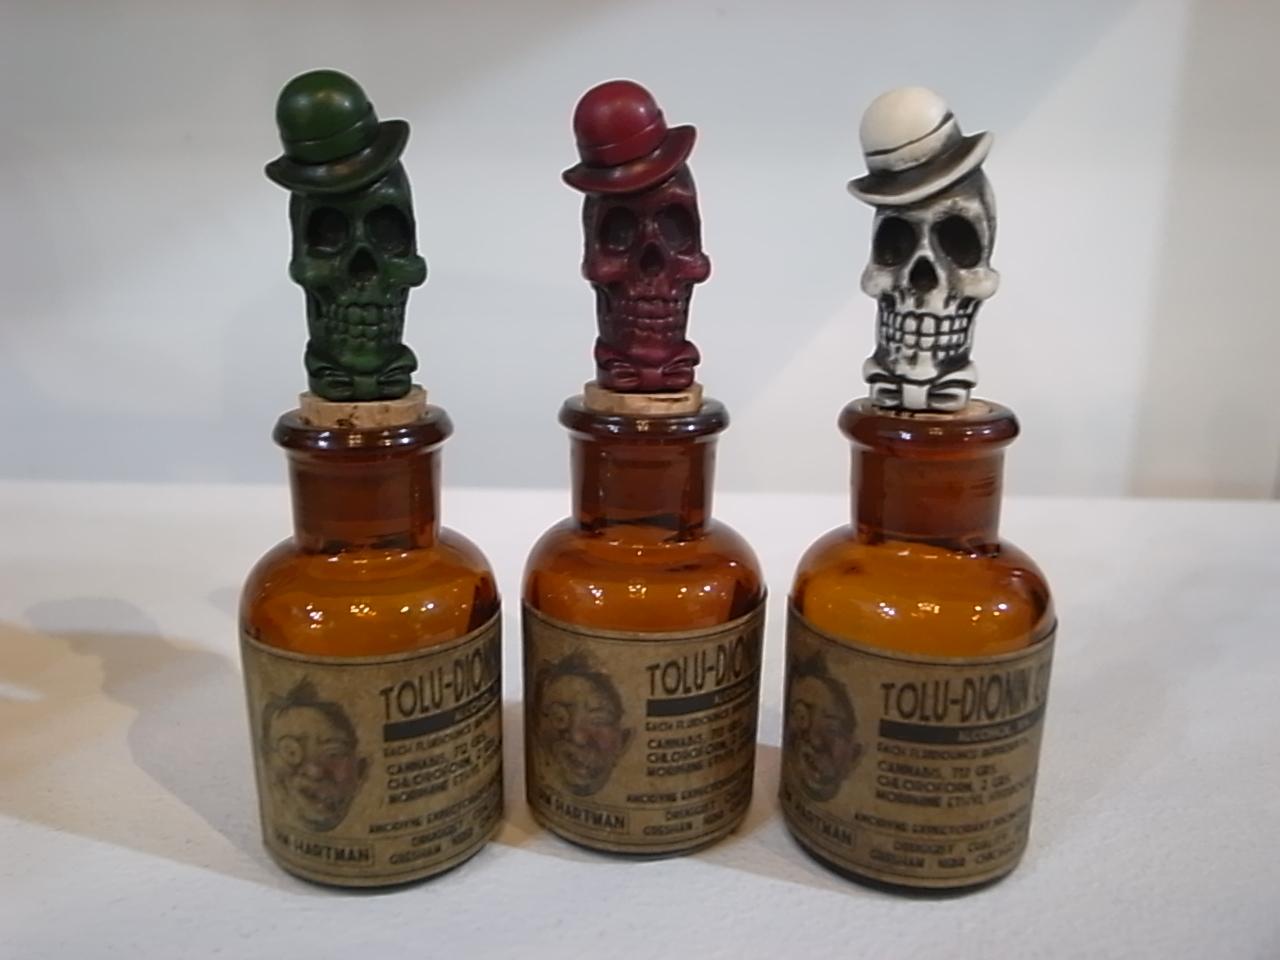 F.B.S.R.MODELS 薬瓶とキーチェーン_a0097901_16584744.jpg